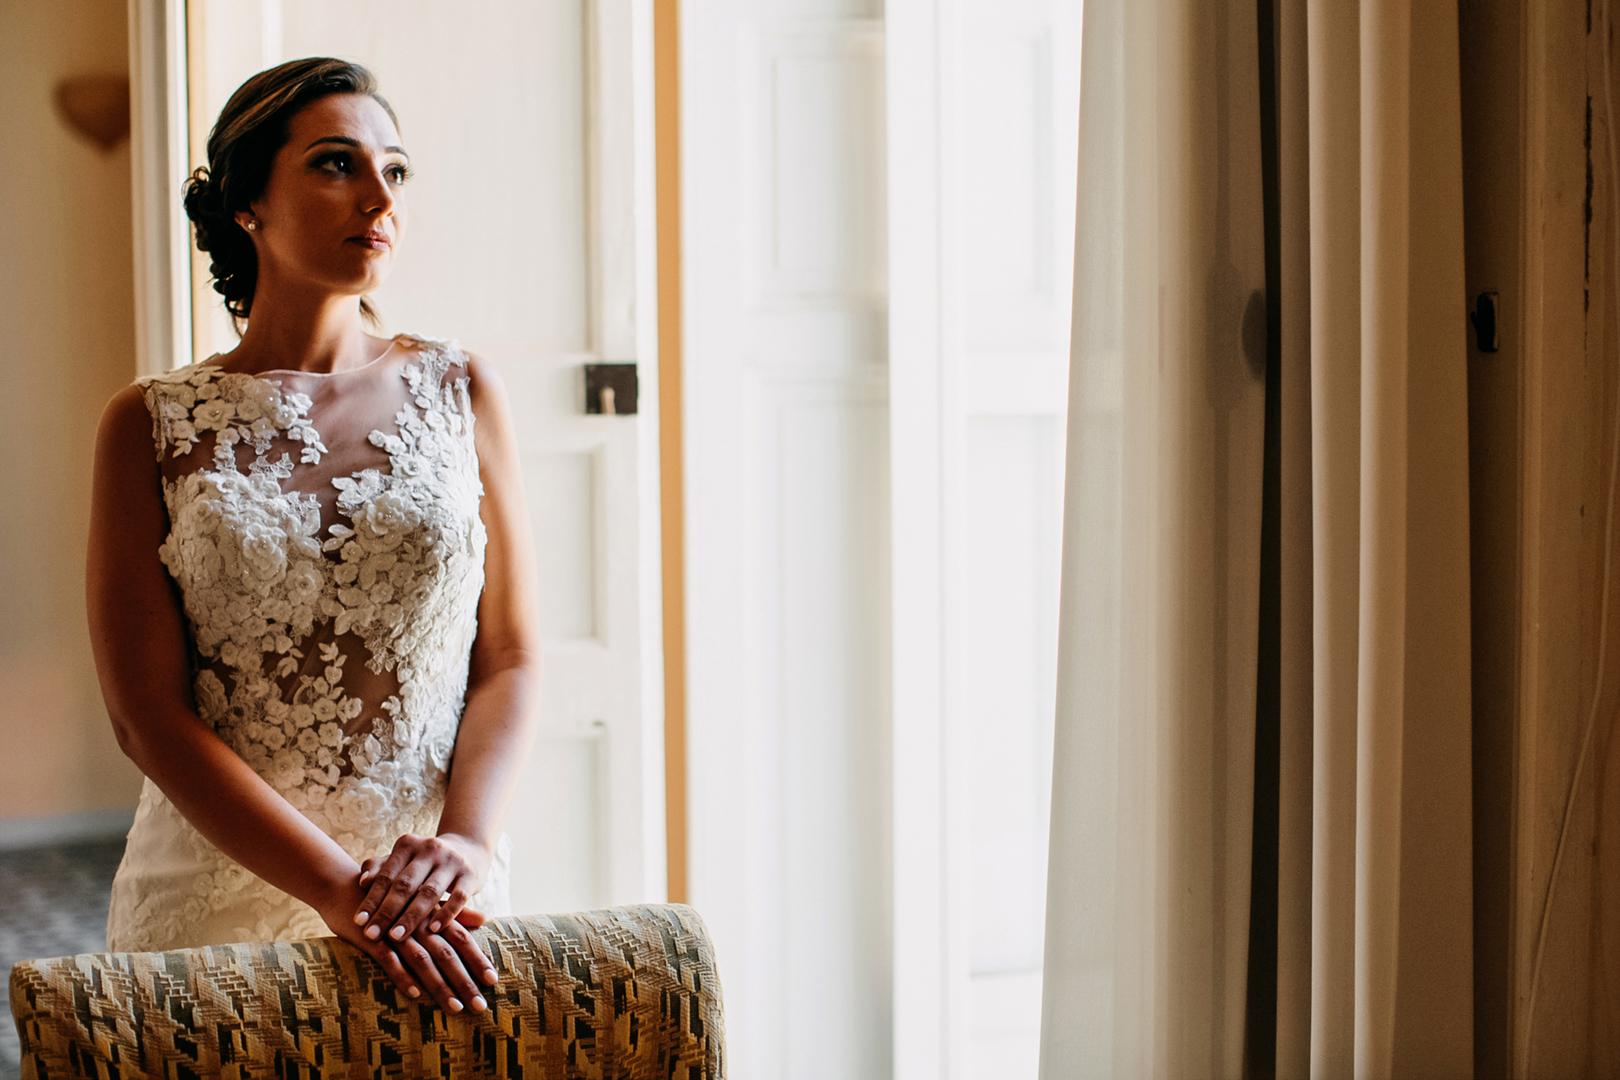 21 gianni-lepore-bride-sposa-abito-dress-palazzo-dauria-wedding-italia-